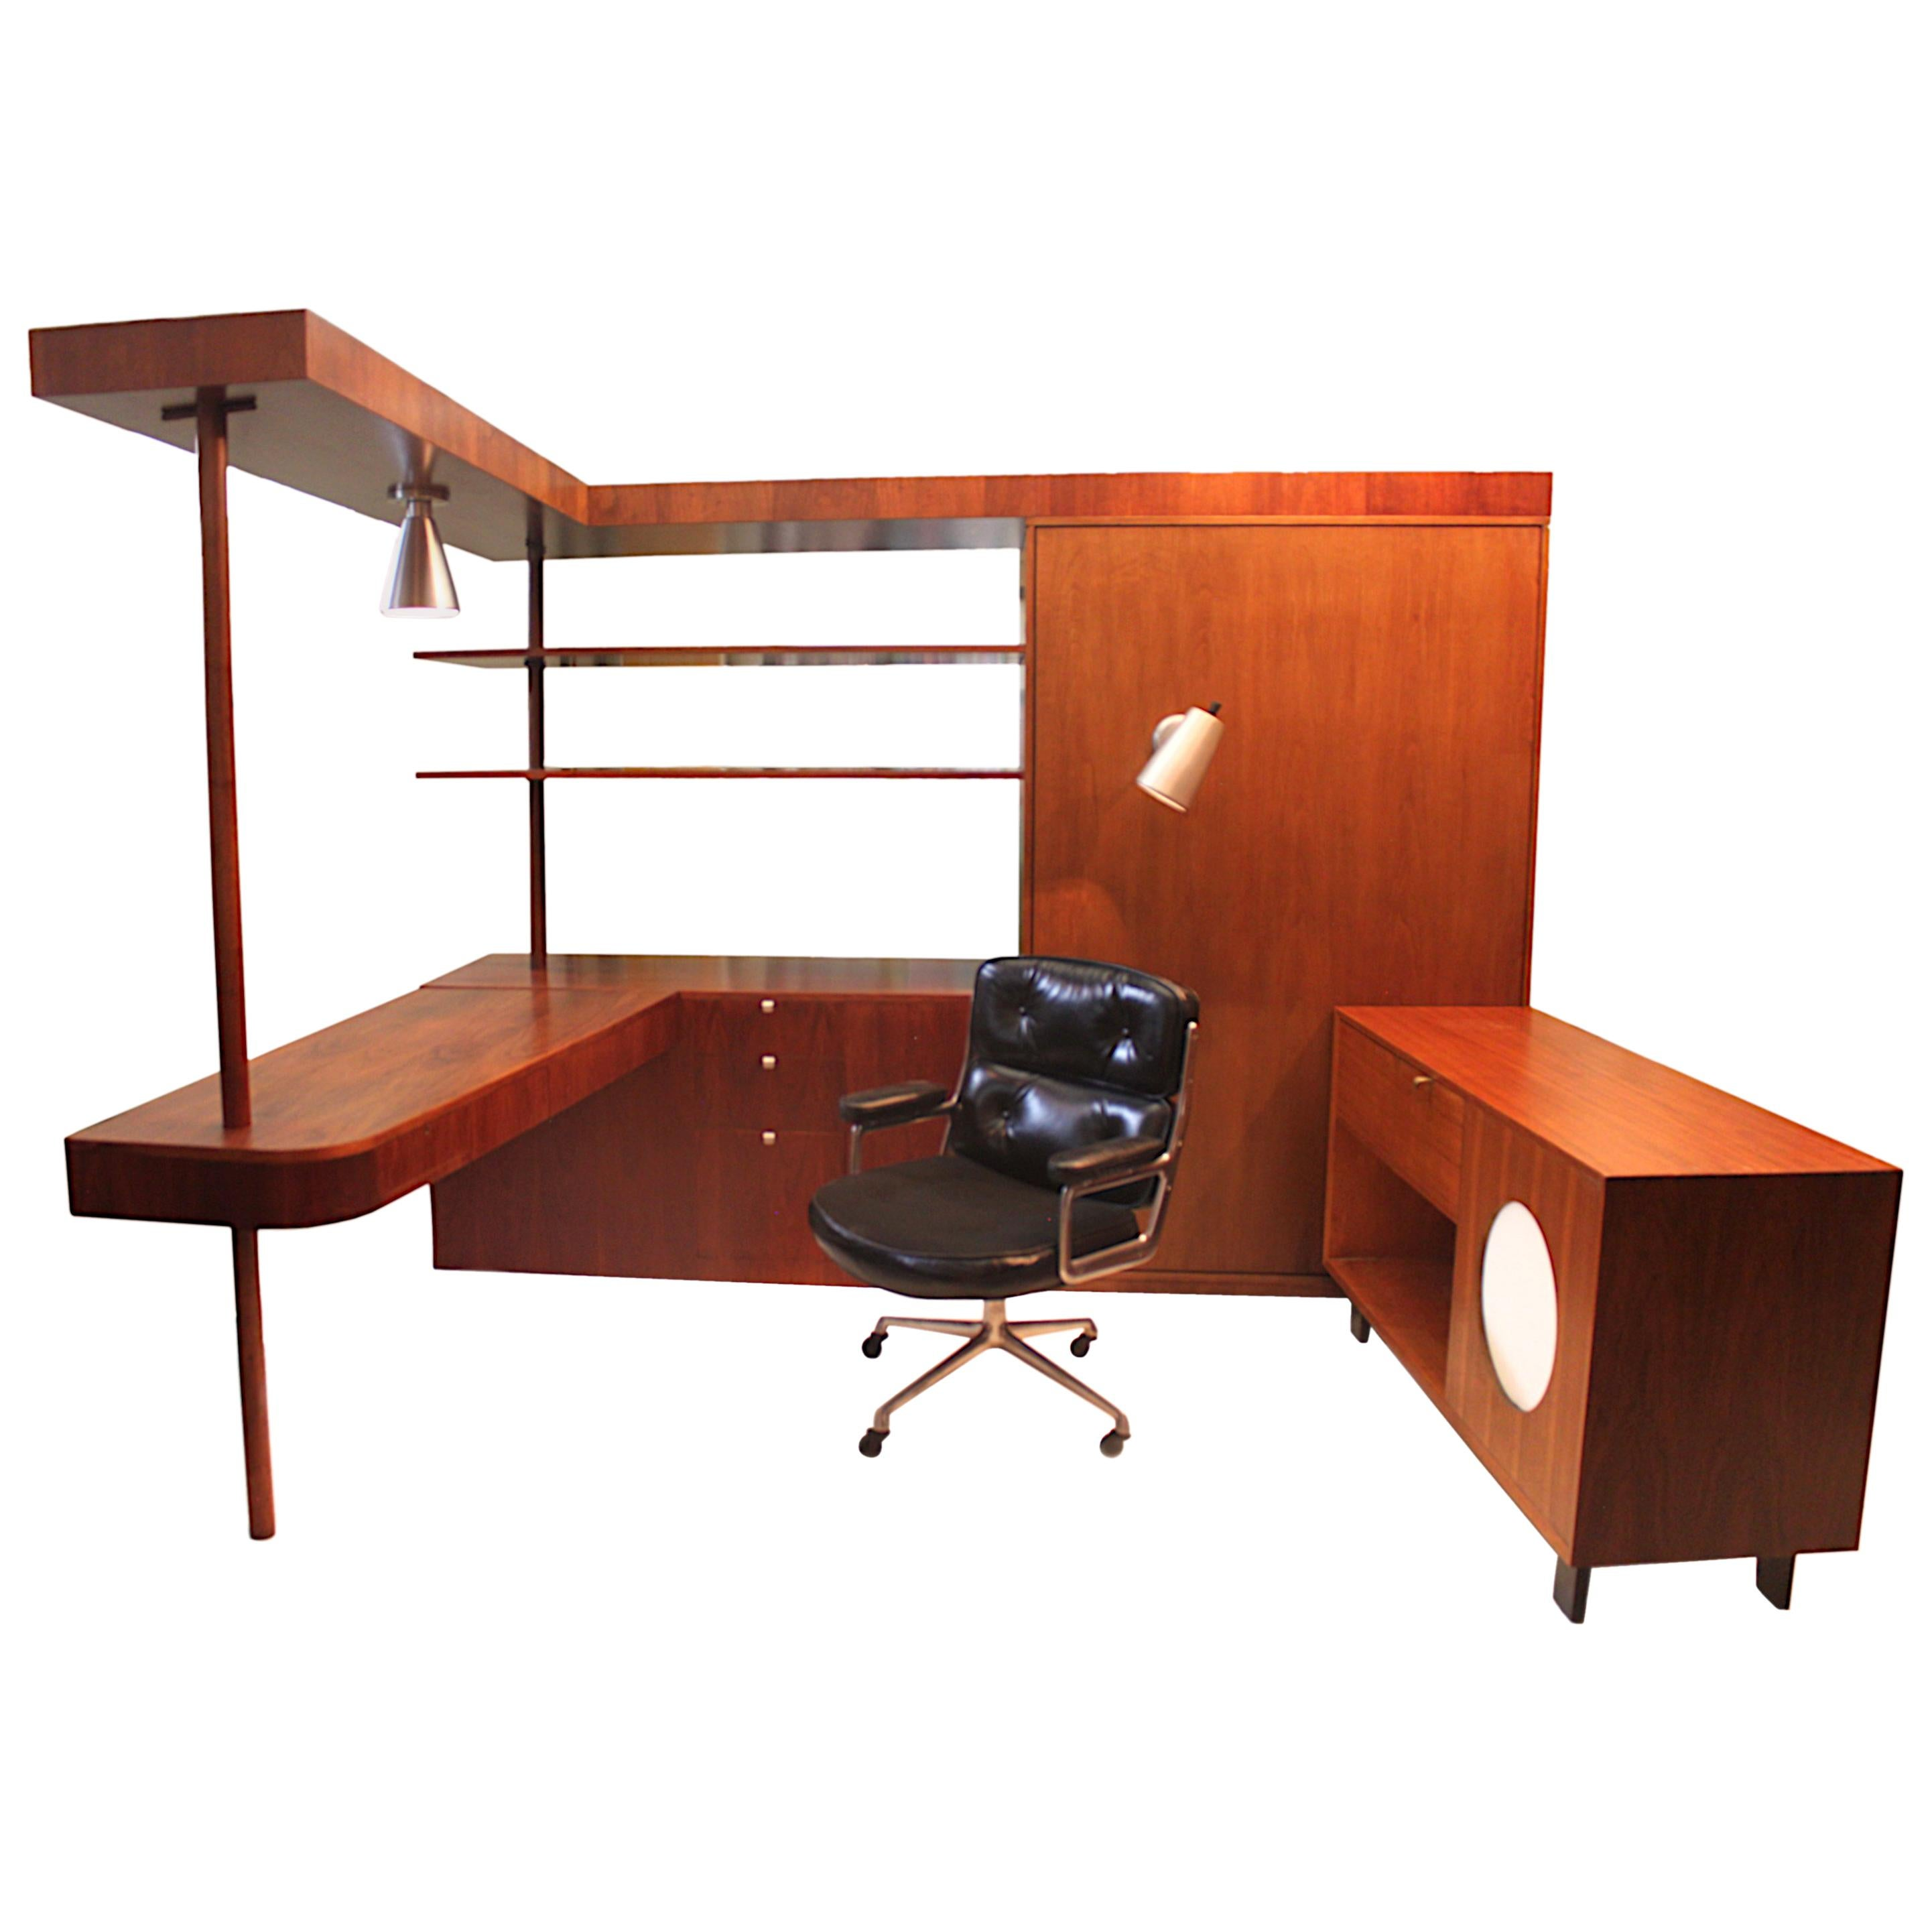 Vintage office desk Executive Vintage 1949 Midcentury Modern Custom Lshaped Office Desk By George Nelson For Ebay Vintage 1949 Midcentury Modern Custom Lshaped Office Desk By